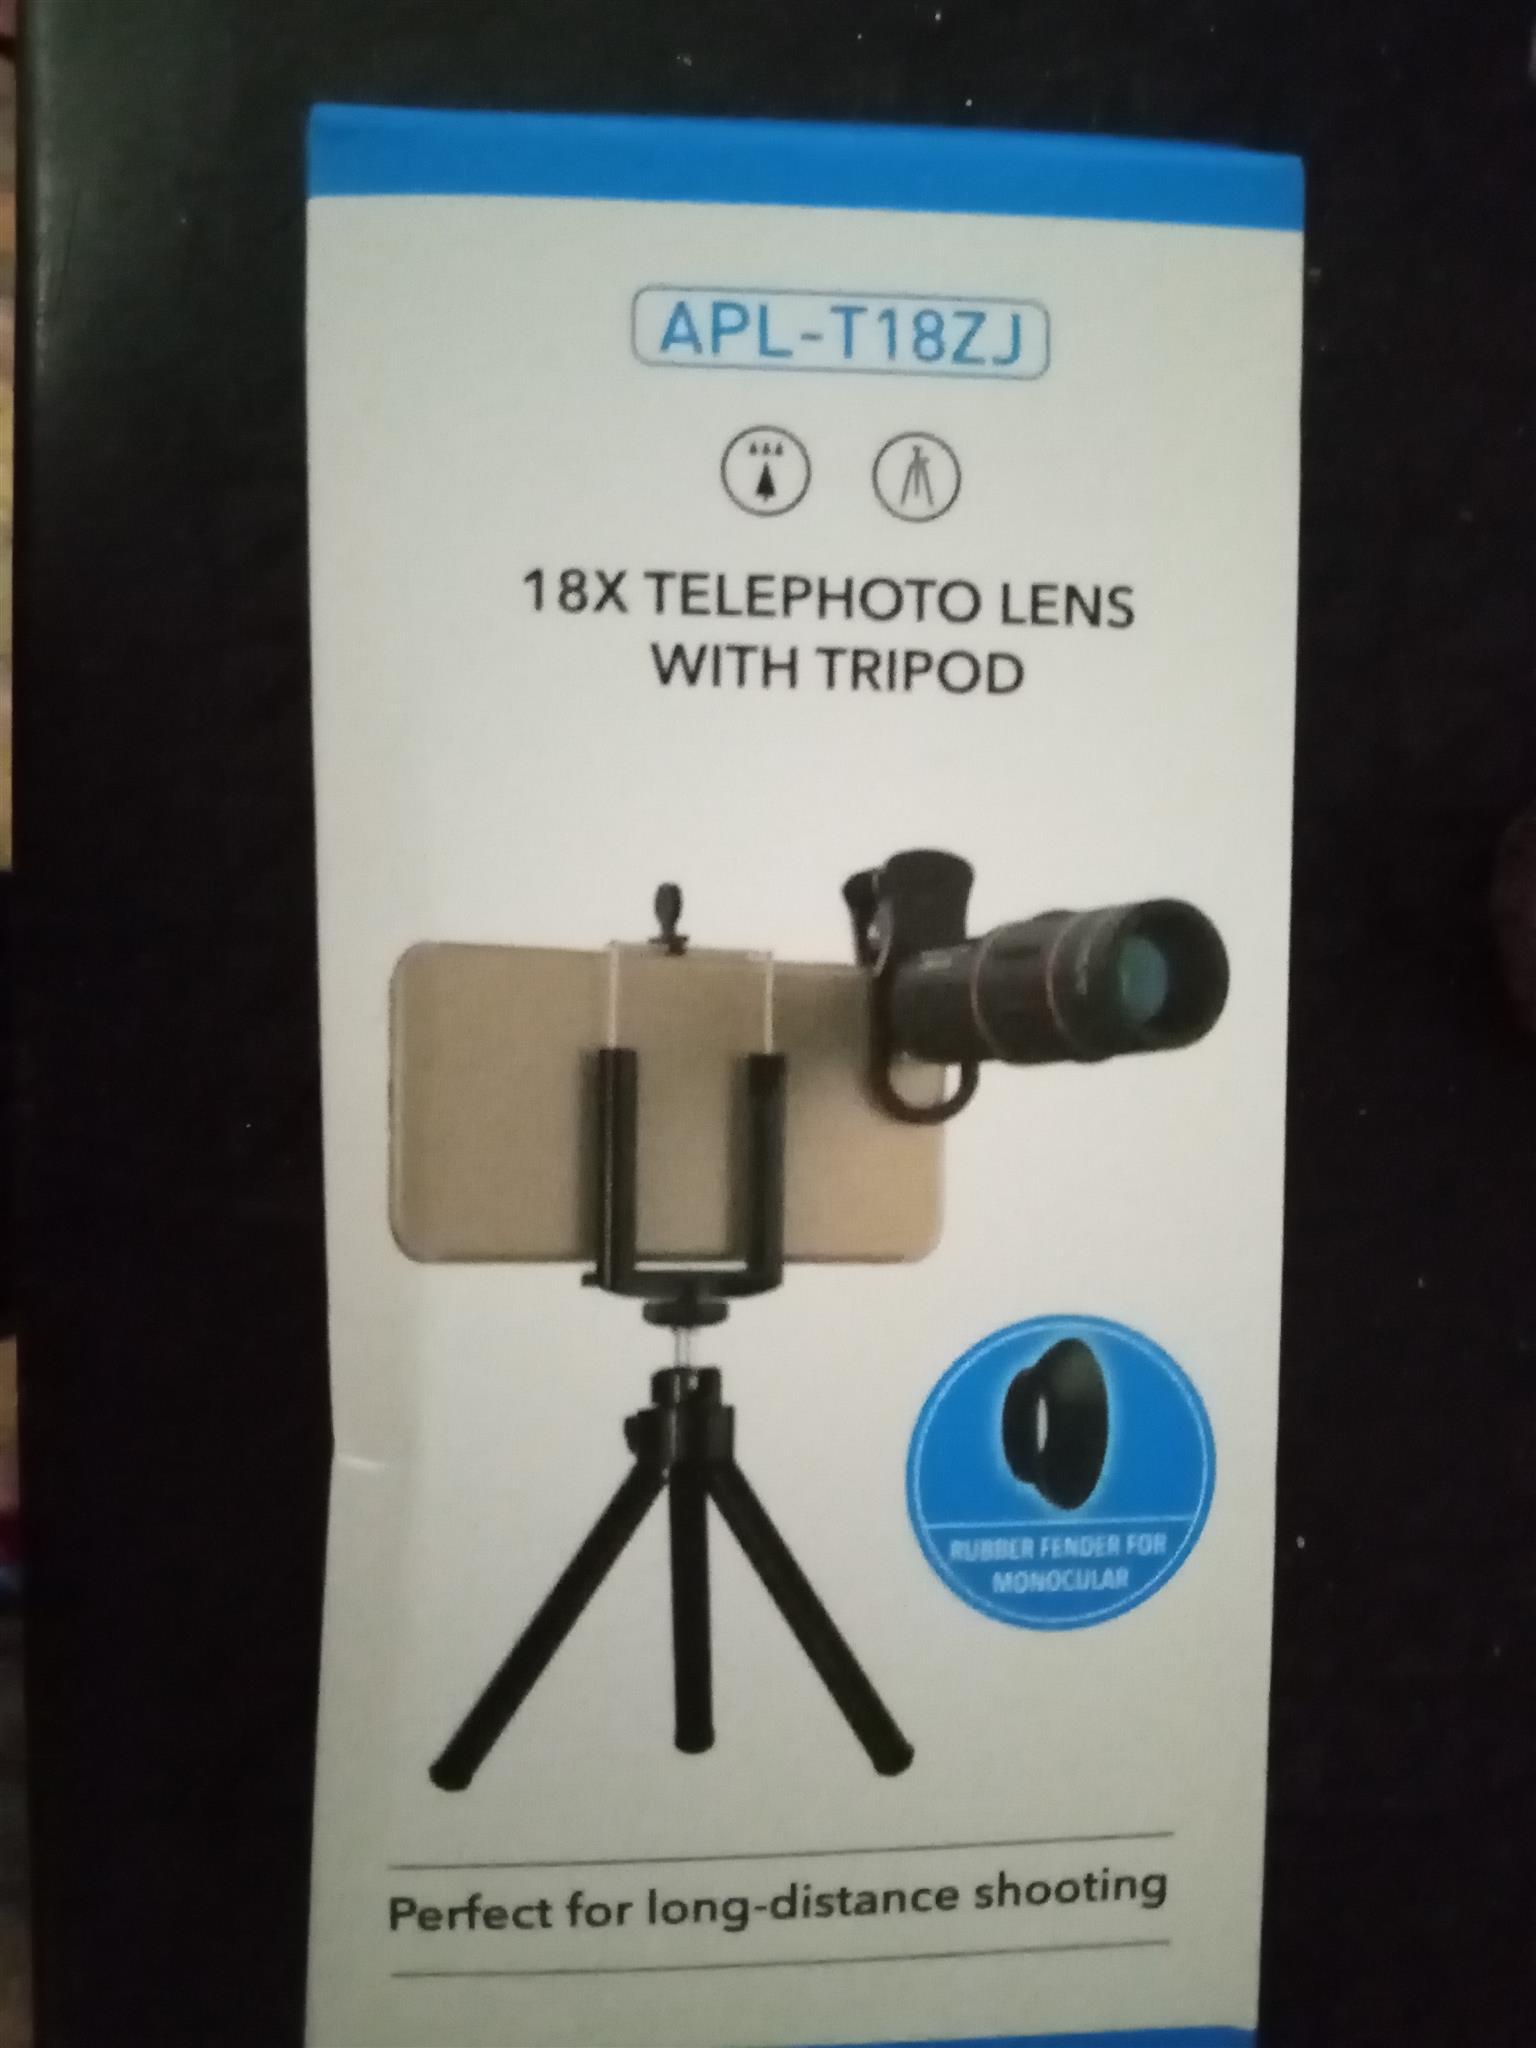 Telephoto lens with tripod